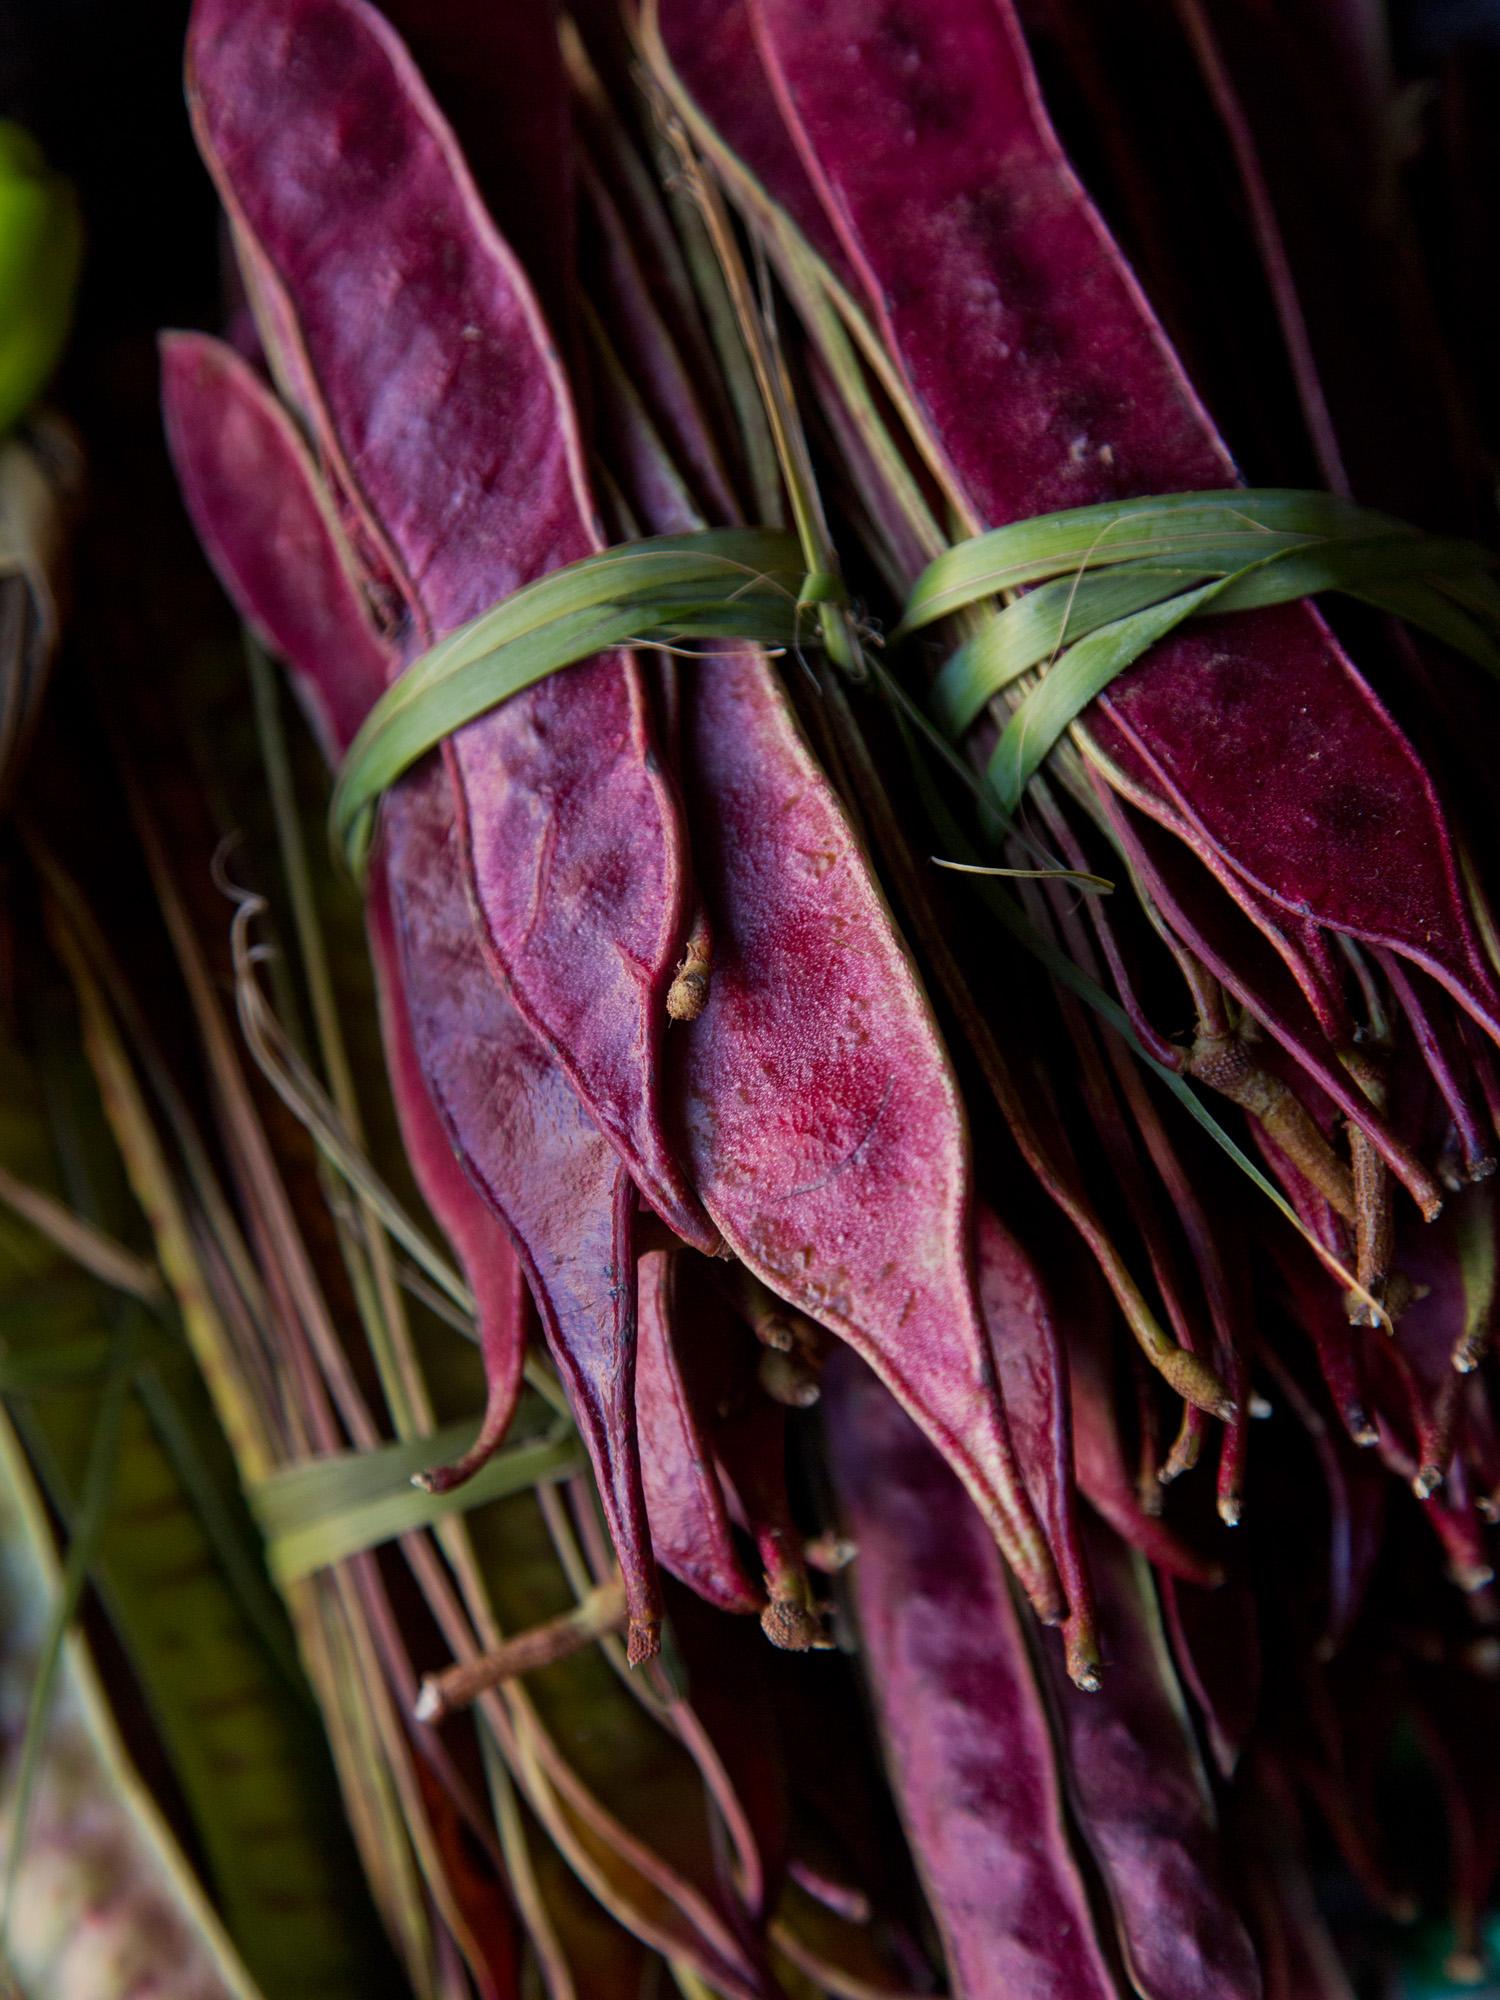 Beans, Oaxaca, Mexico